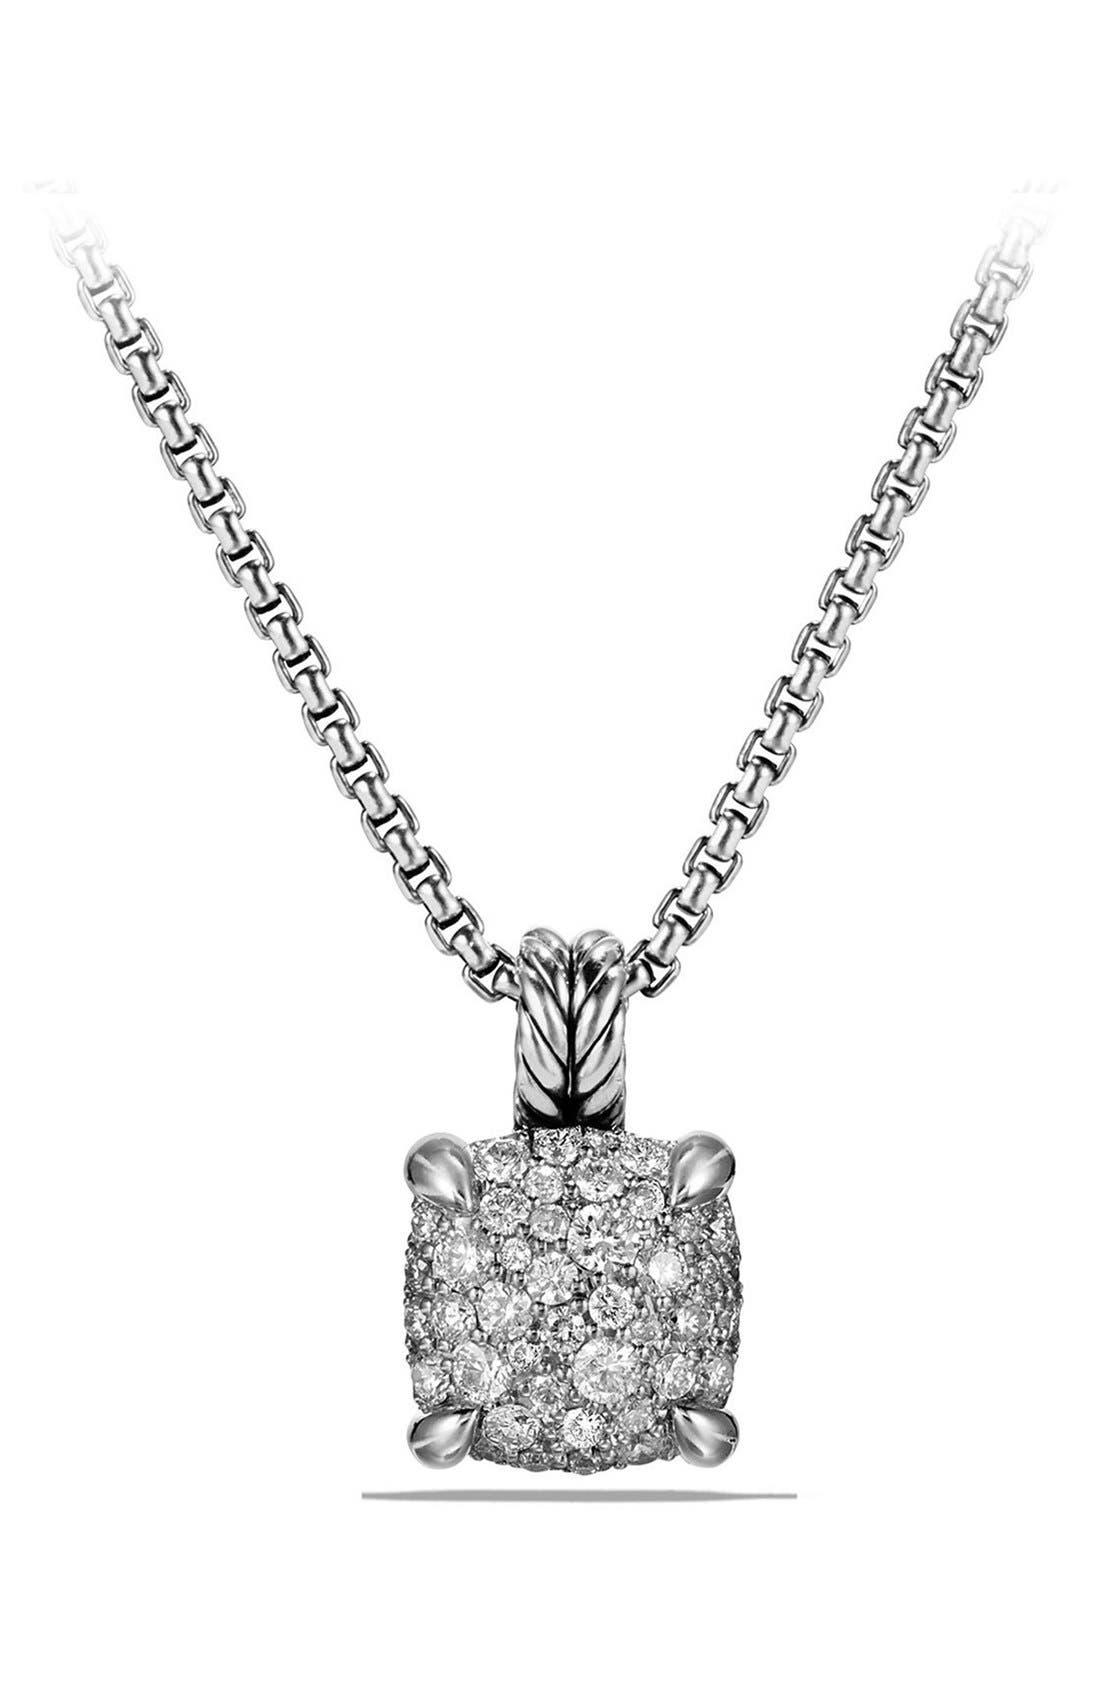 Main Image - David Yurman 'Châtelaine' Pendant Necklace with Diamonds